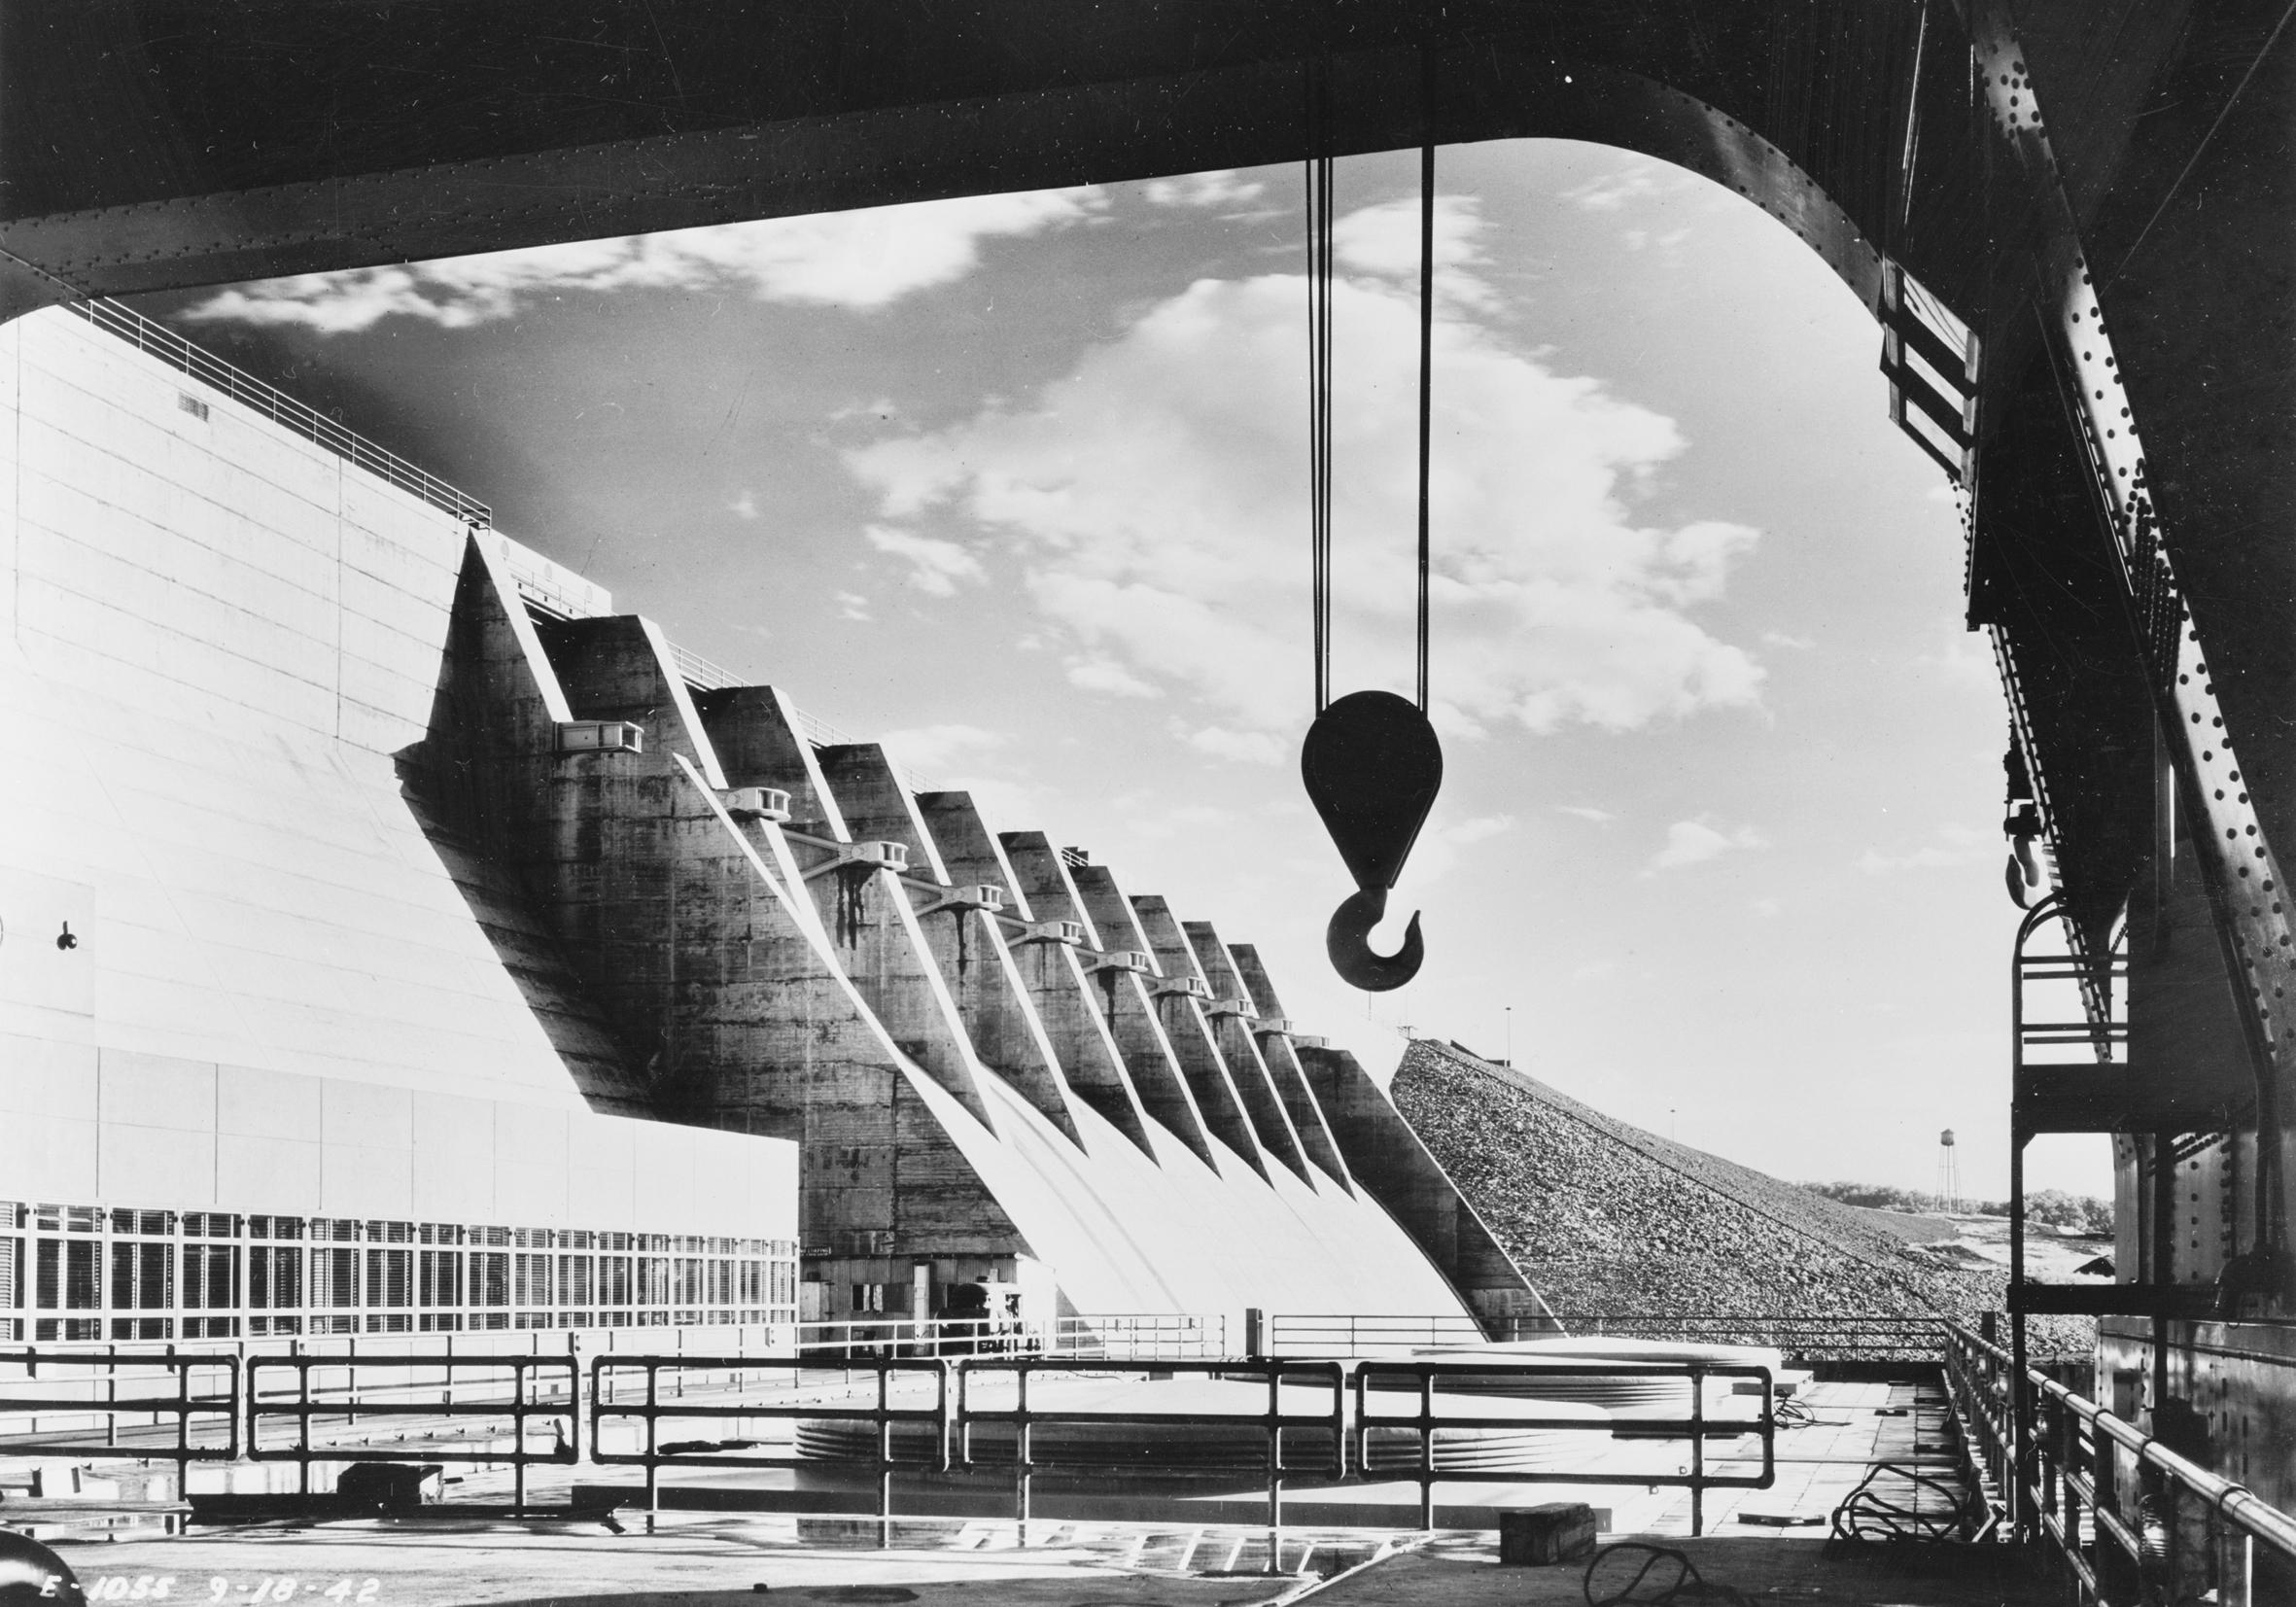 (3) Presa Cherokee de la TVA en construcción (Tennessee, 1945) © Library of Congress. Prints and Photographs Division